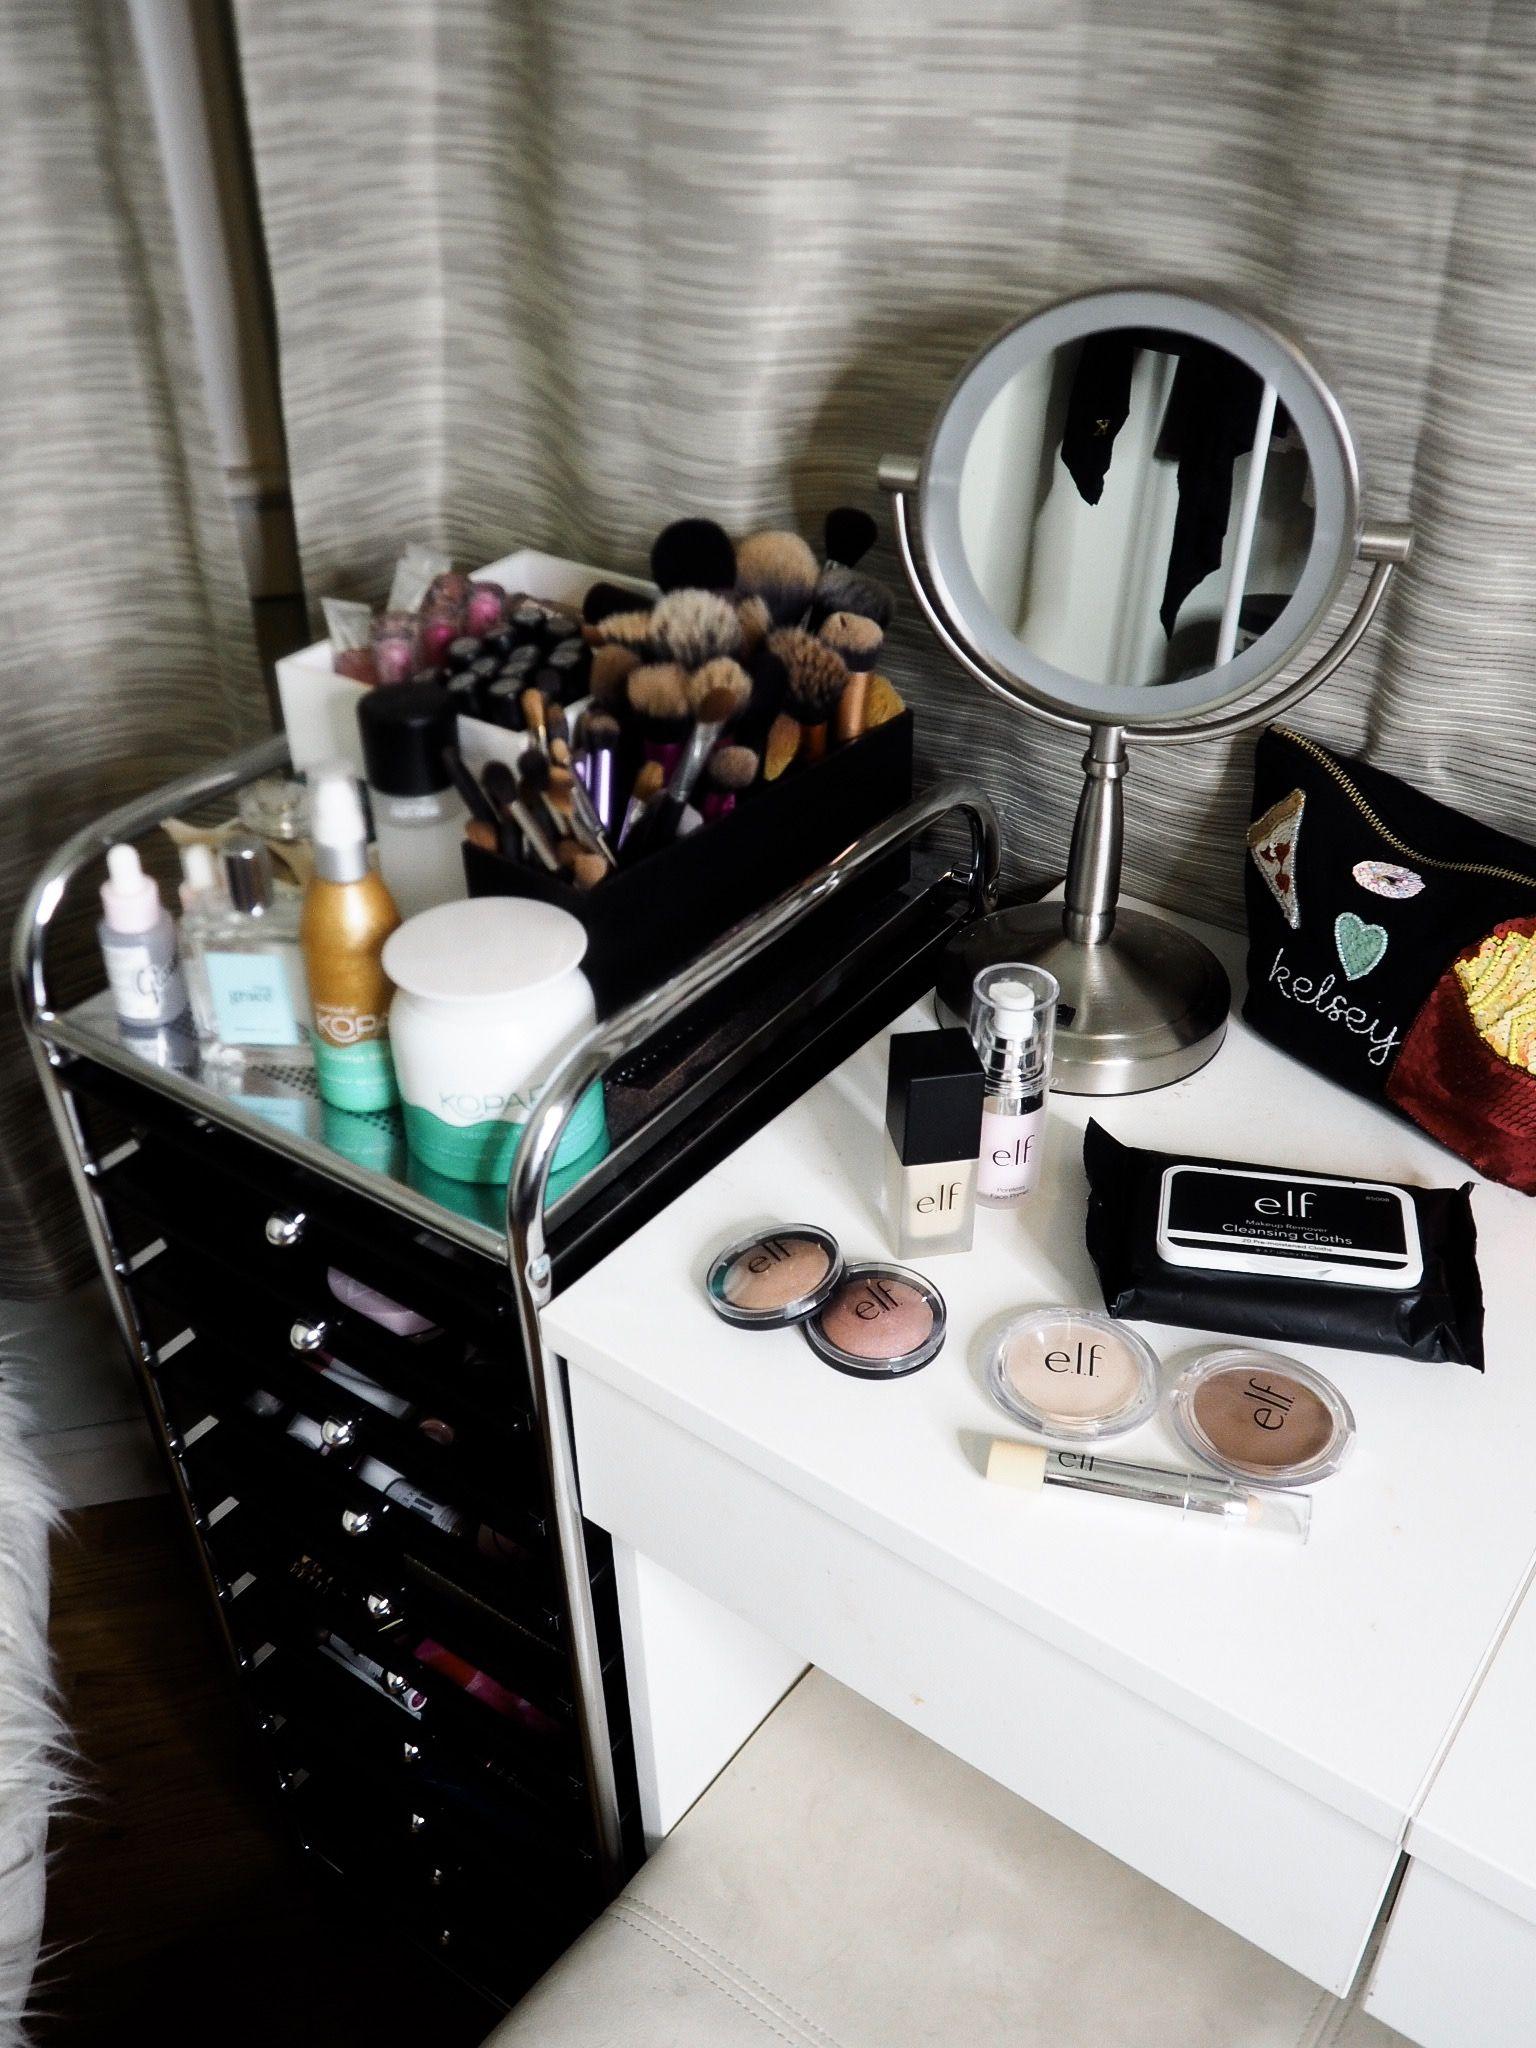 Affordable Beauty My Top Elf Cosmetics Picks! Elf